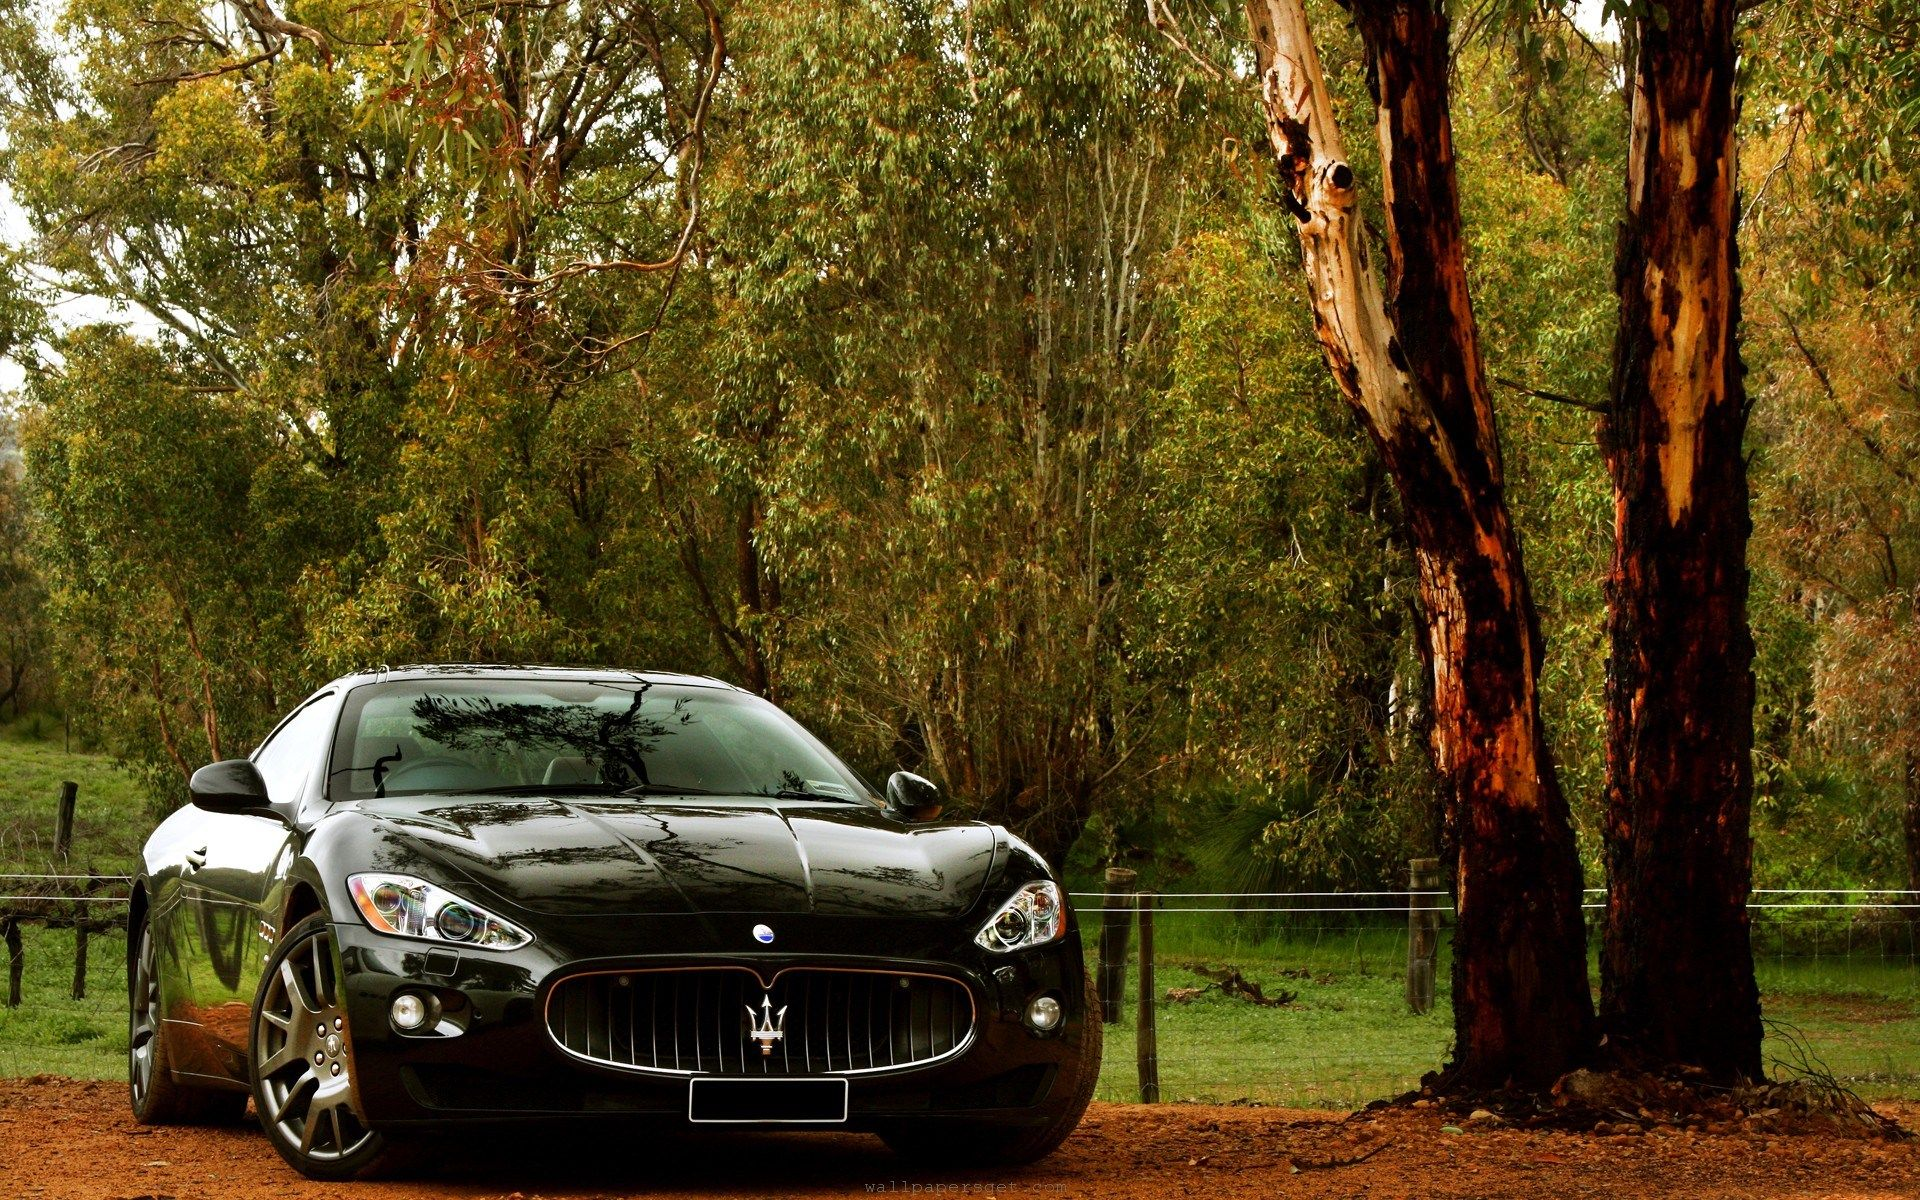 Maserati Wallpaper For Mac By Wednesday Backer 2017 03 09